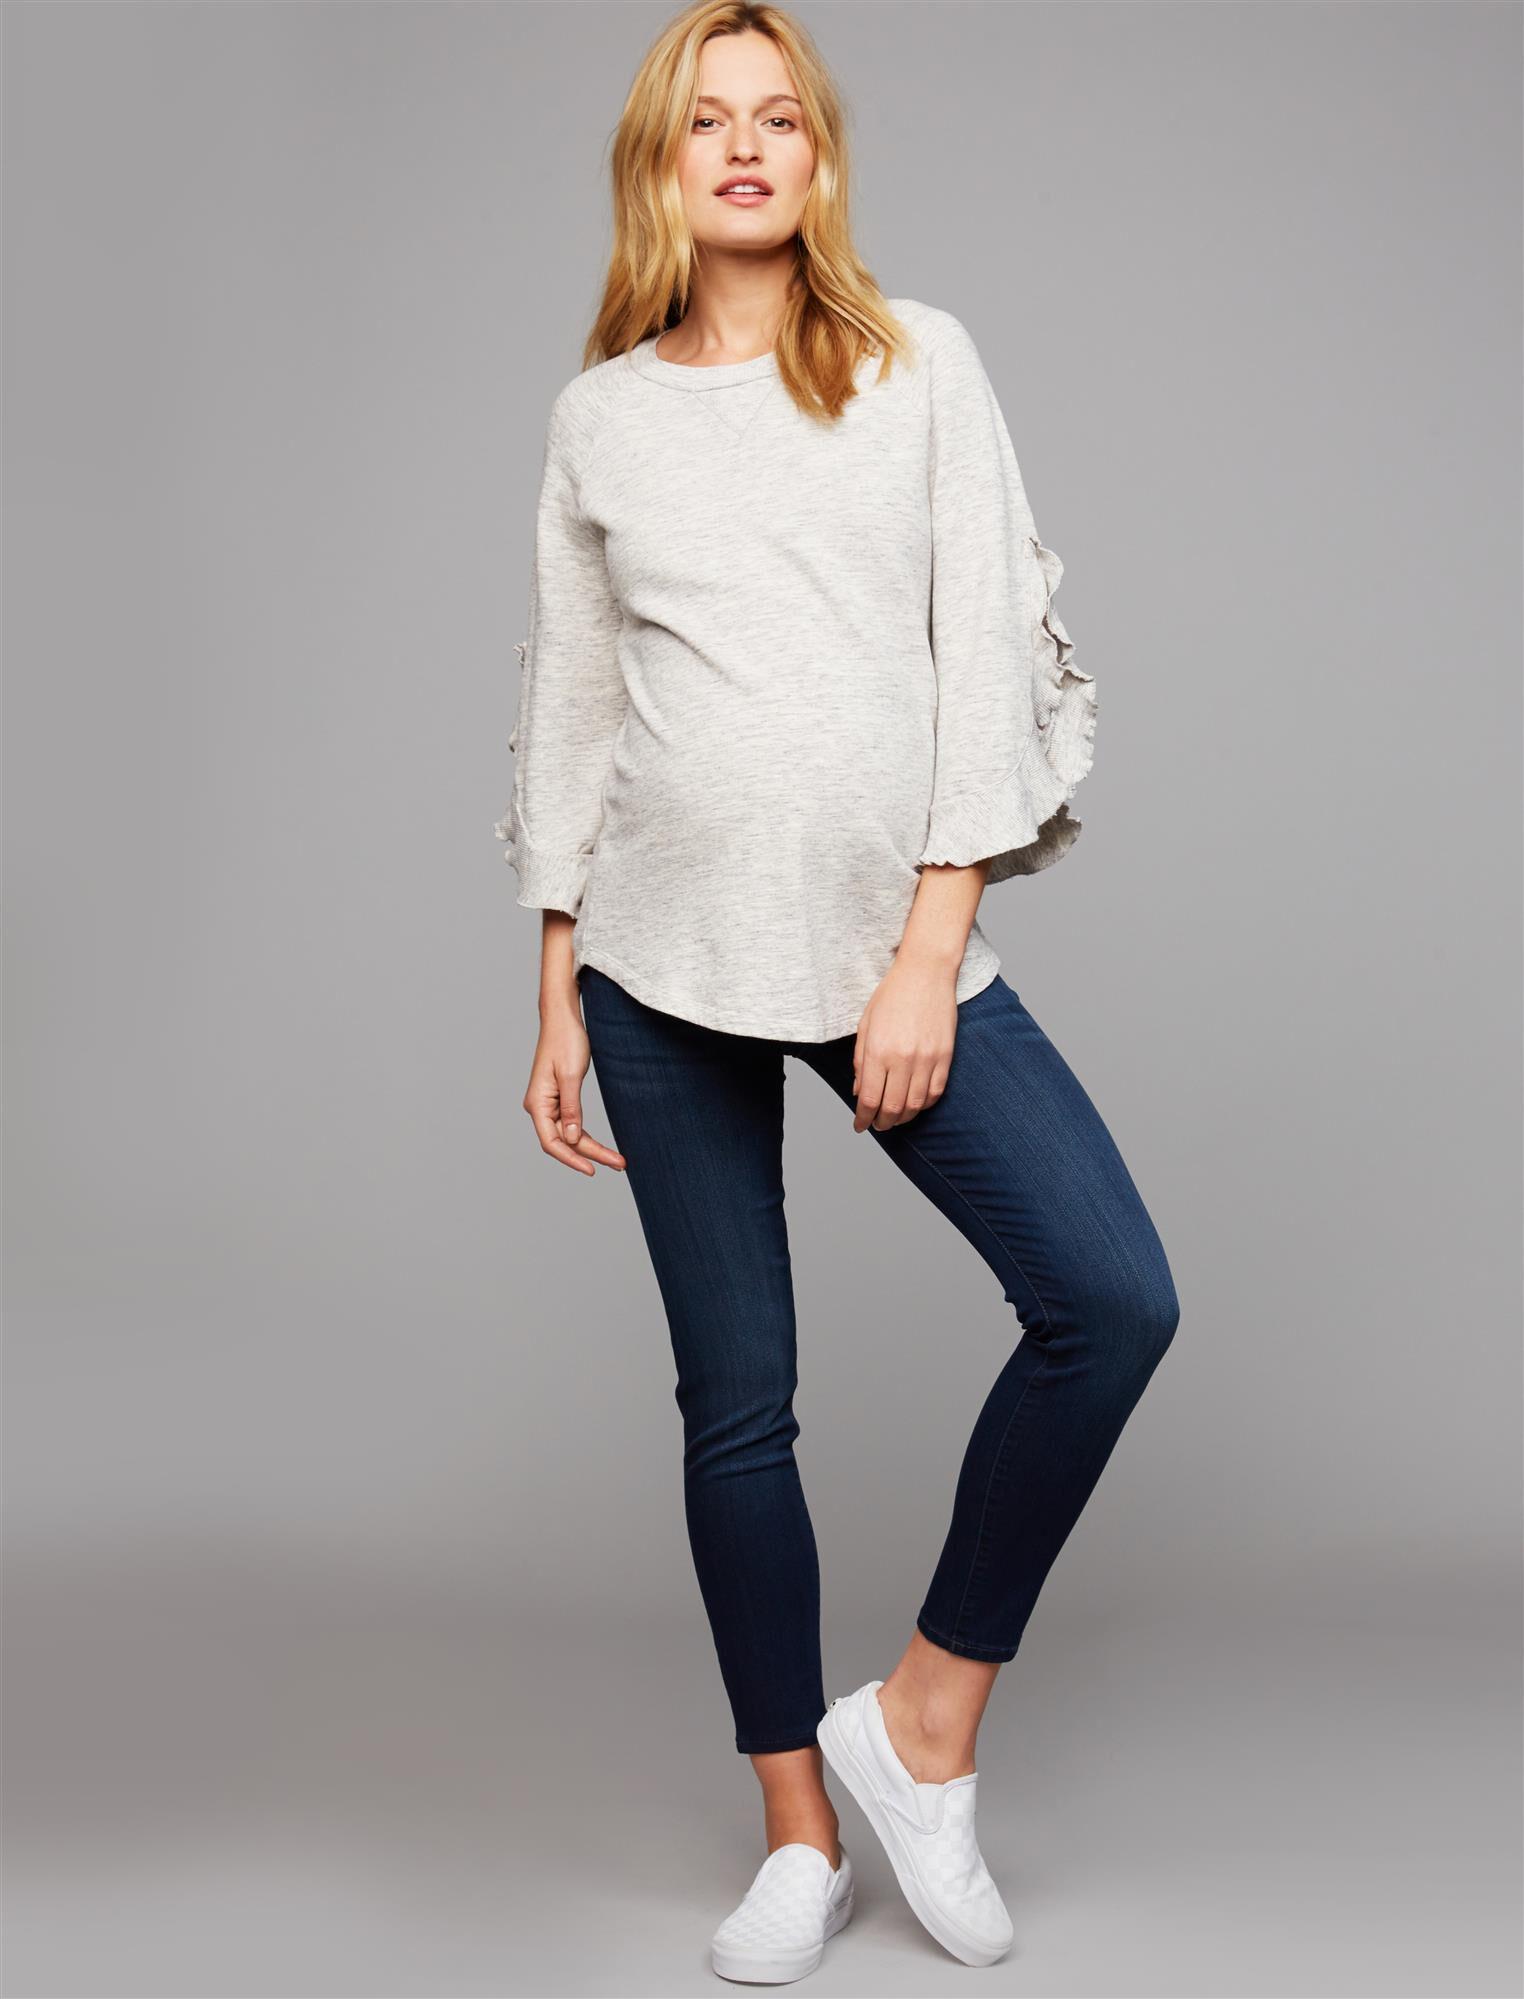 DL1961 Under Belly Jess Skinny Ankle Maternity Jeans